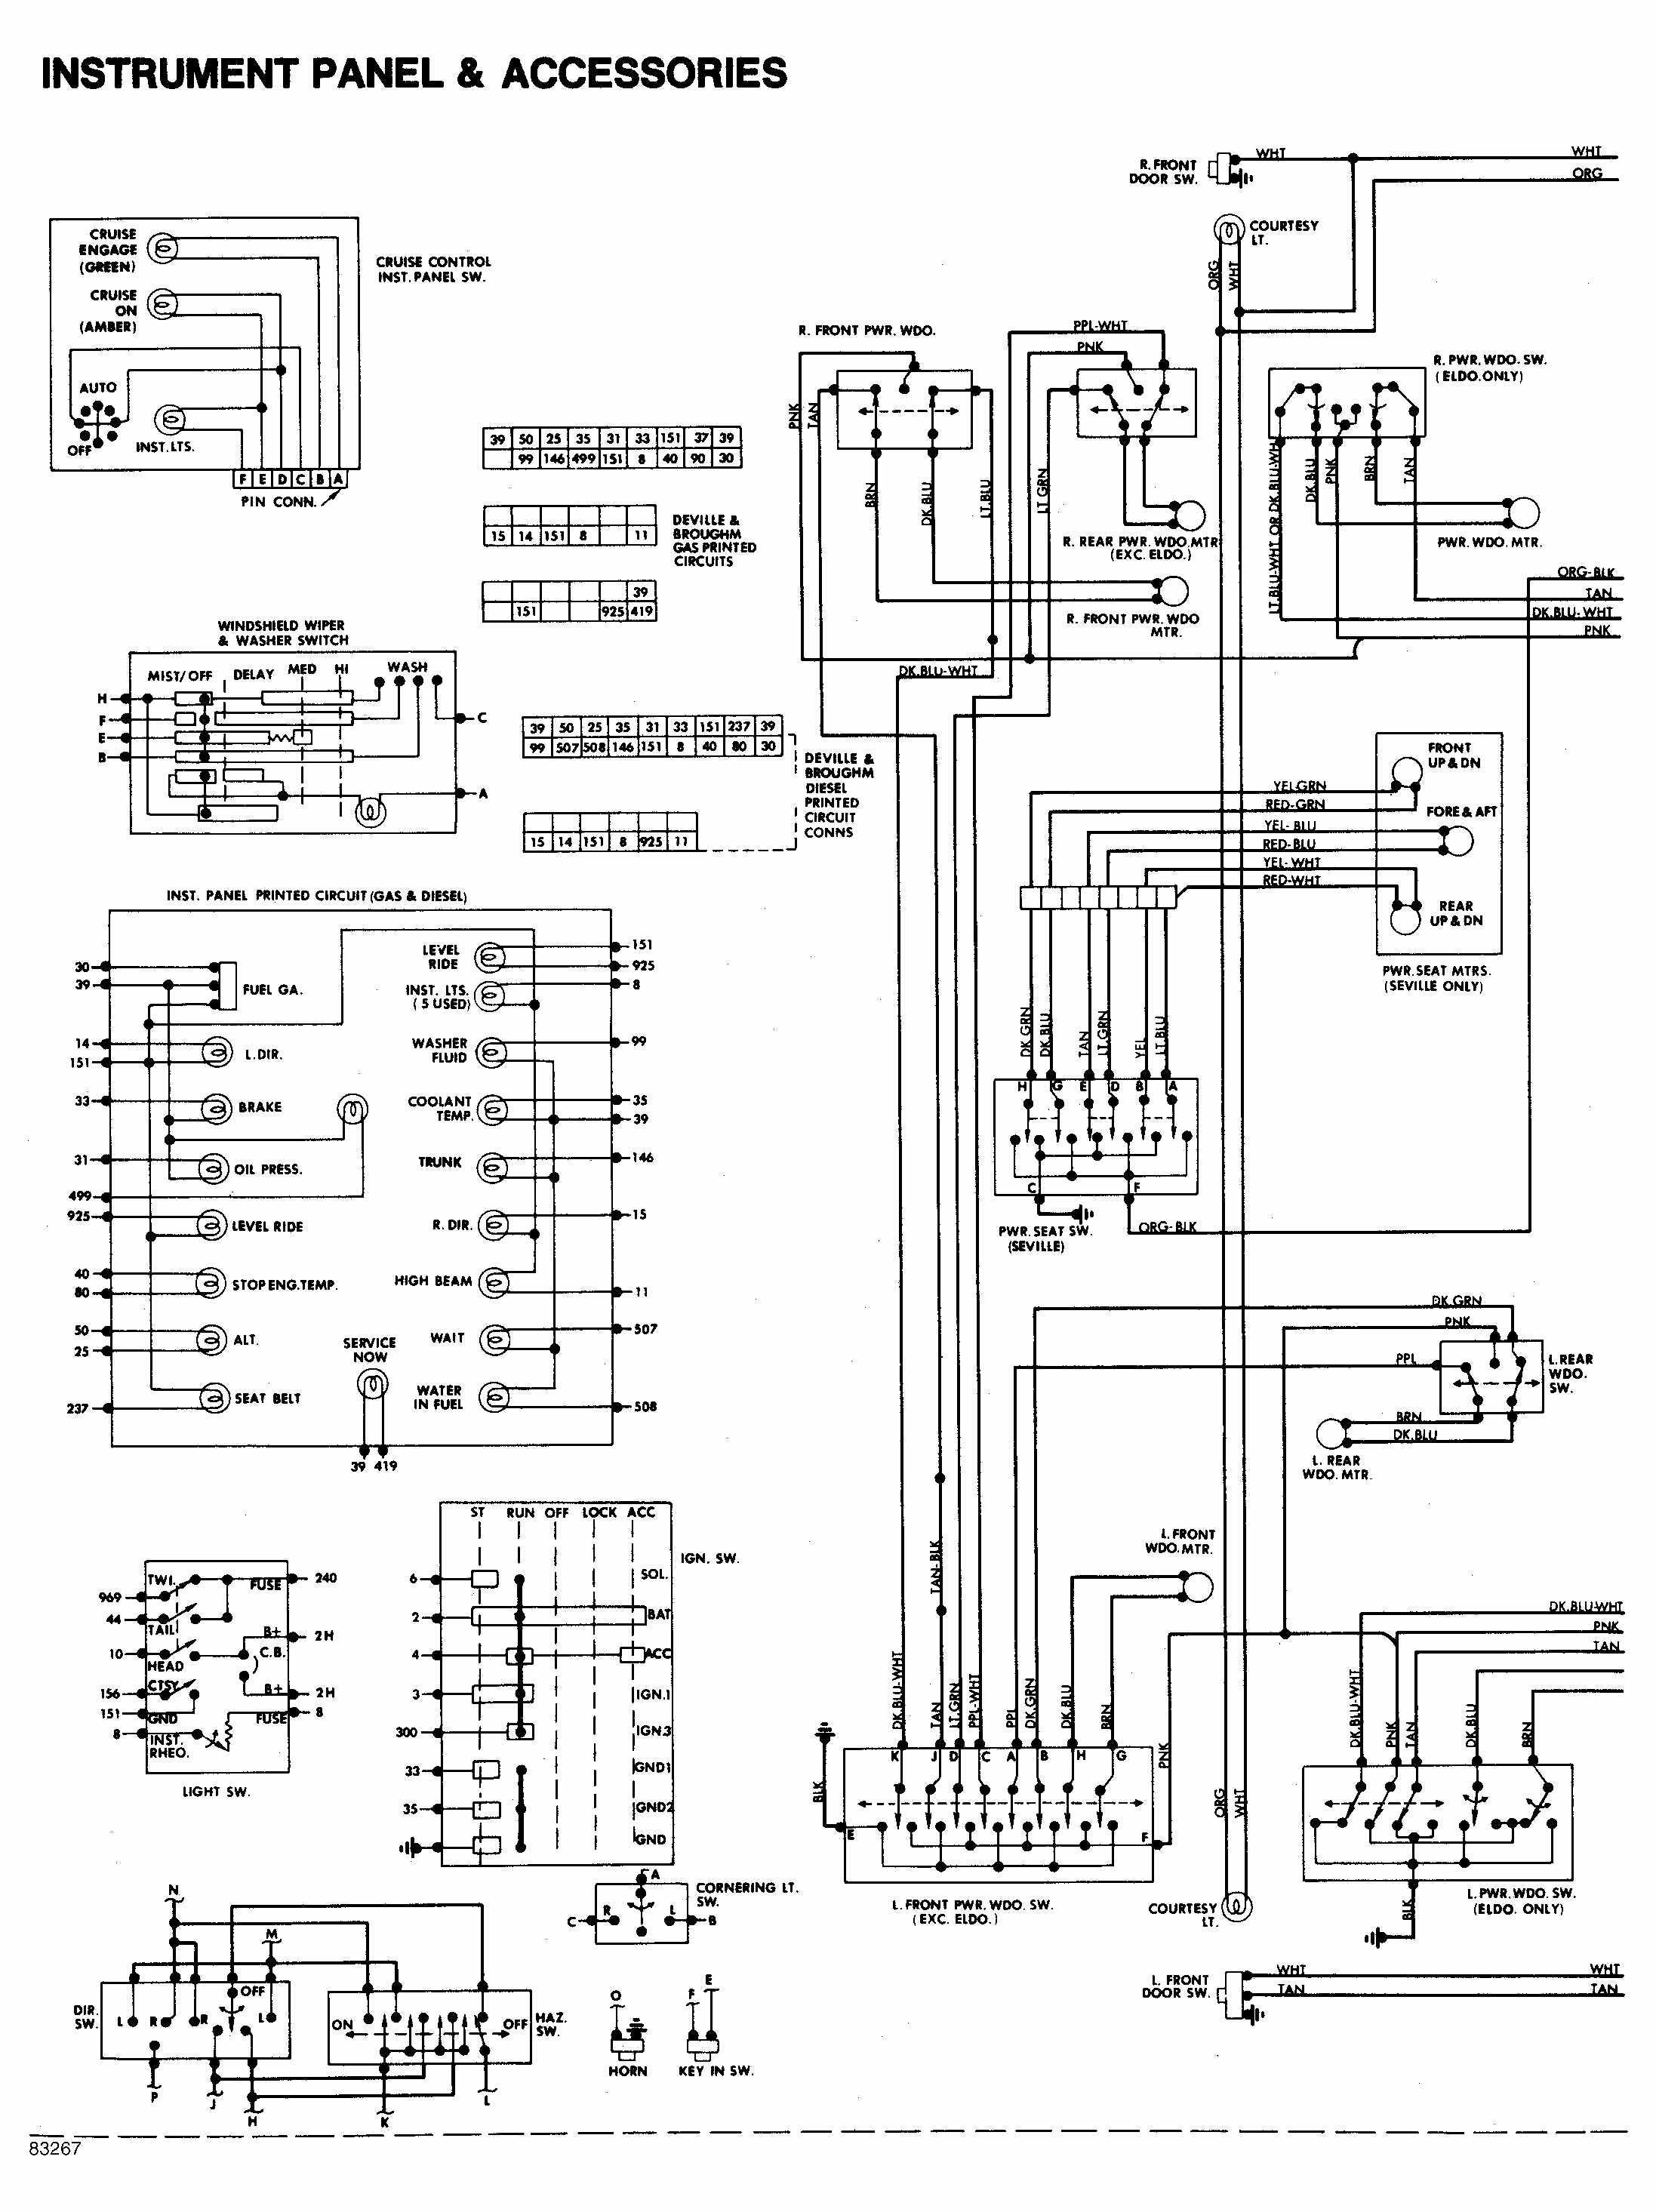 pierce fire truck wiring diagrams product wiring diagrams u2022 rh genesisventures us e-one fire truck wiring diagram